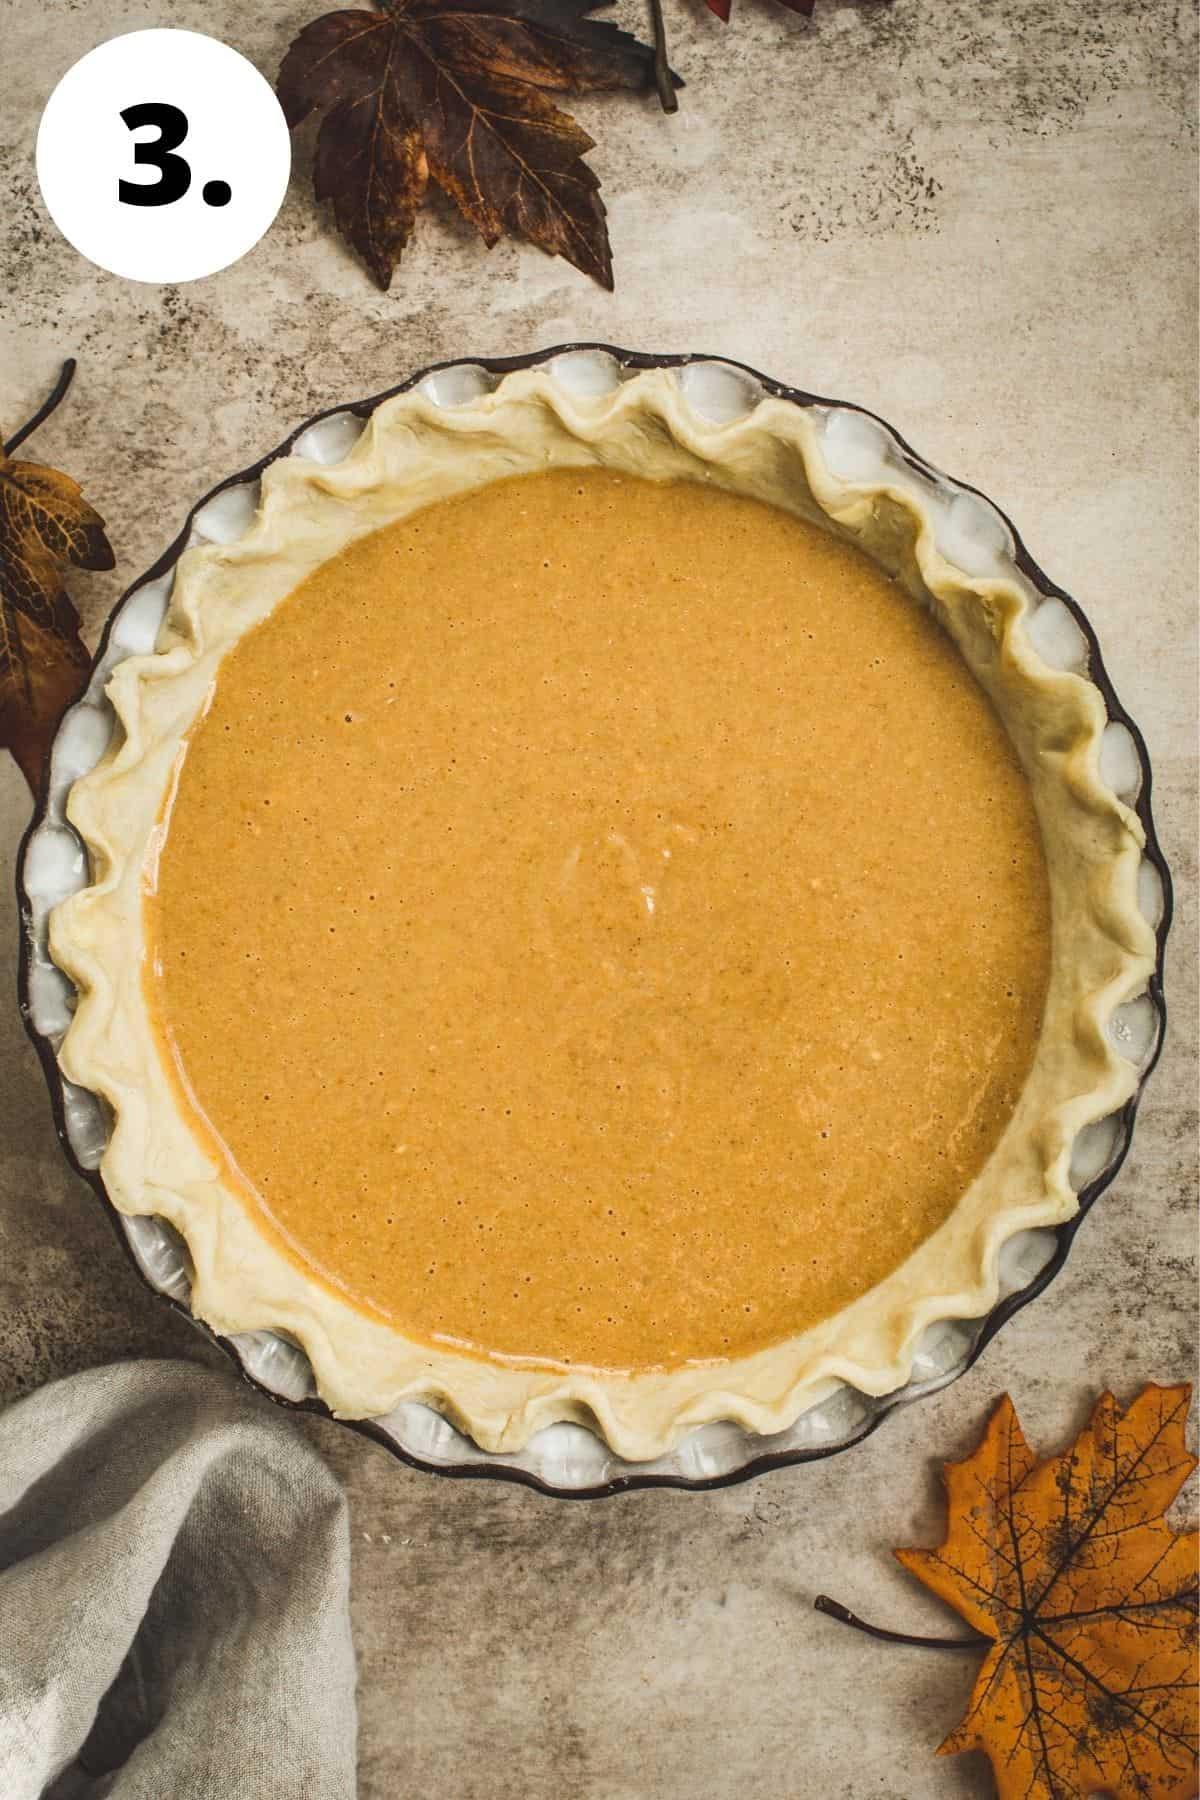 Maple pumpkin pie process step 3.